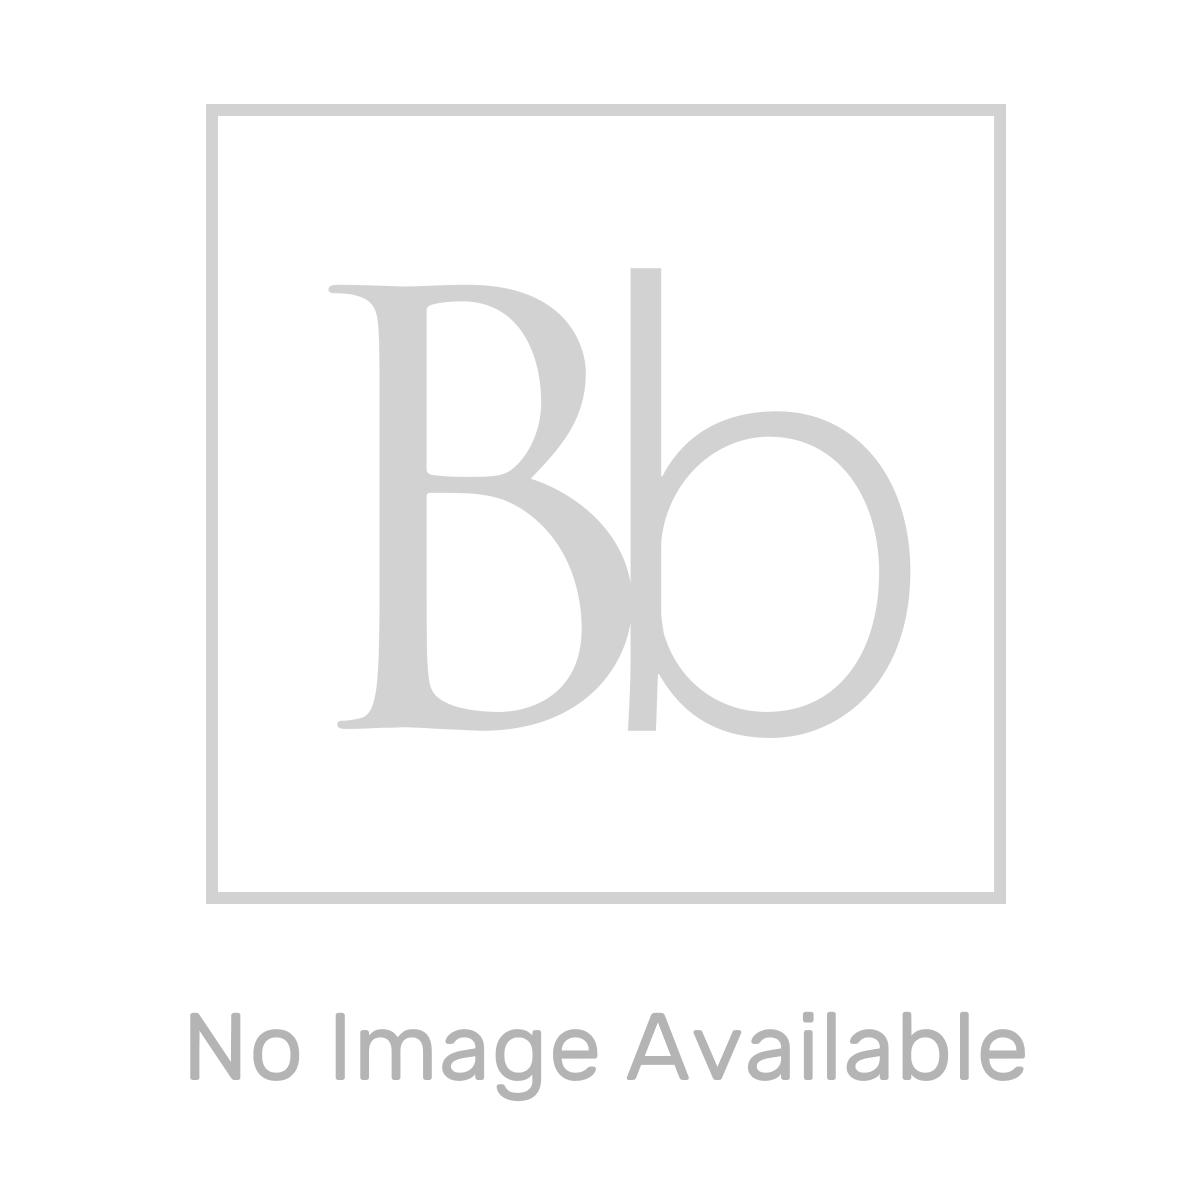 Zenith Cambridge Traditional Bath Shower Mixer Tap Lifestyle